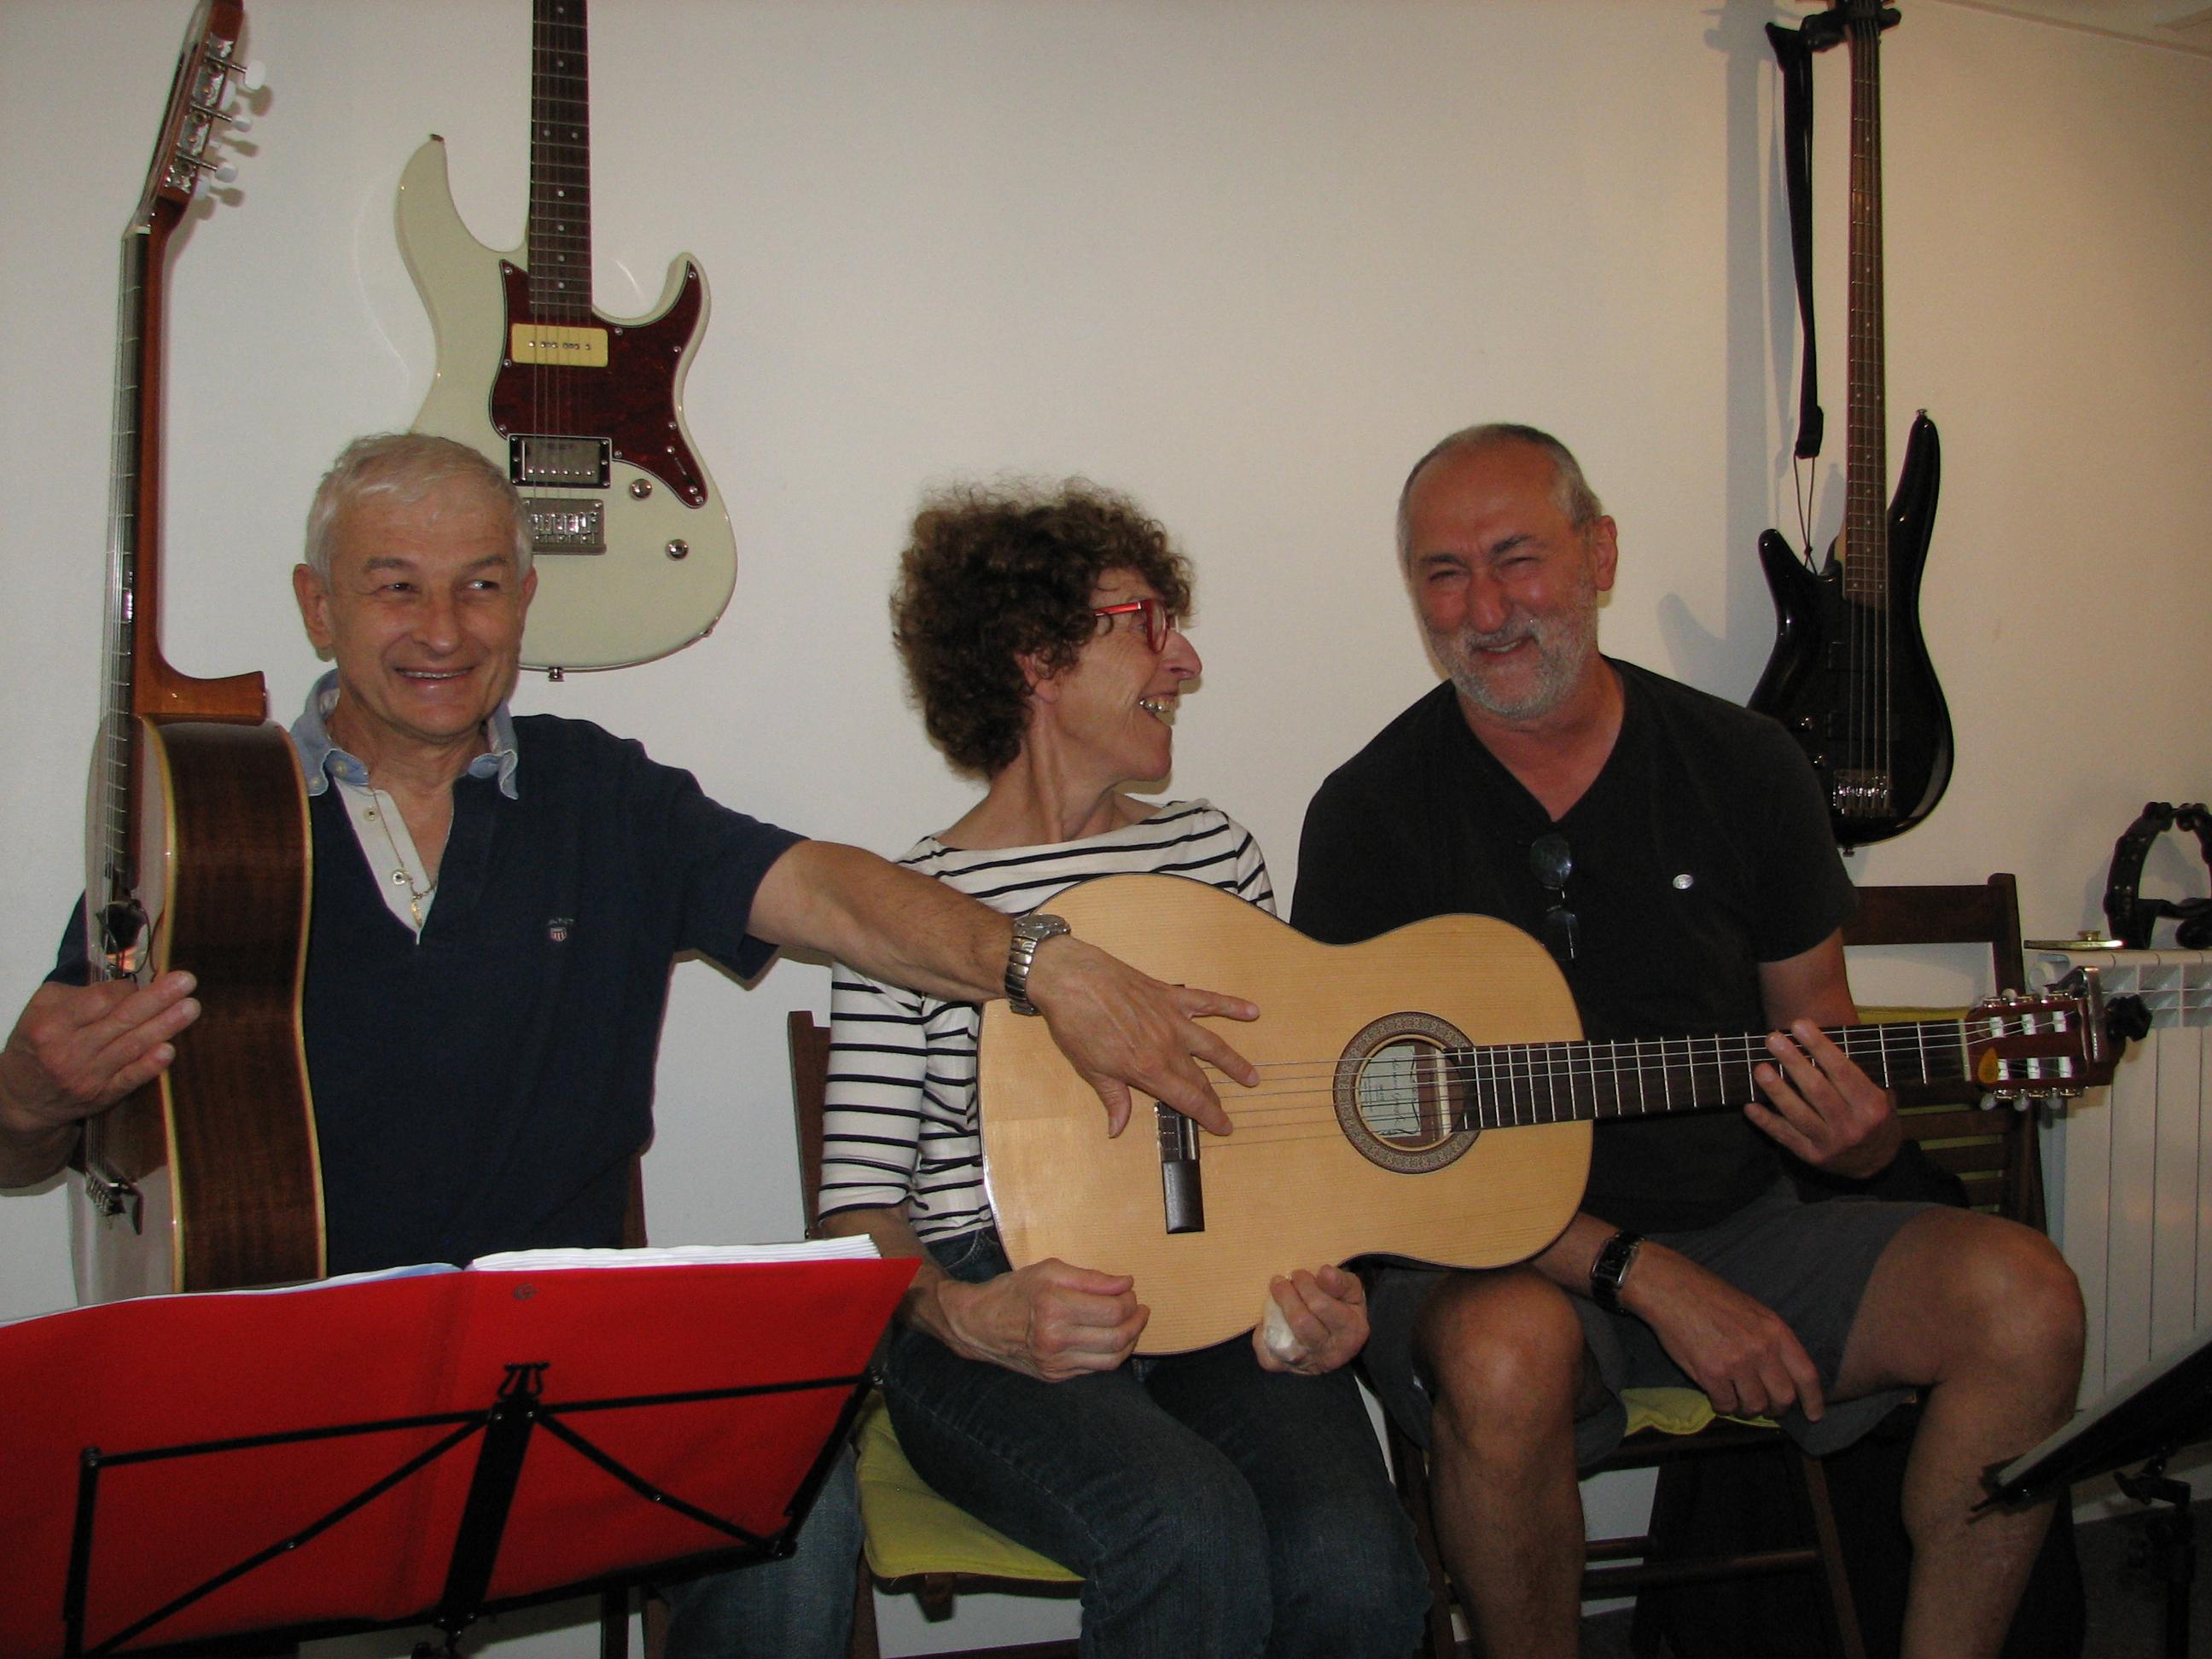 Patrick, Marinette et Jean-pierre